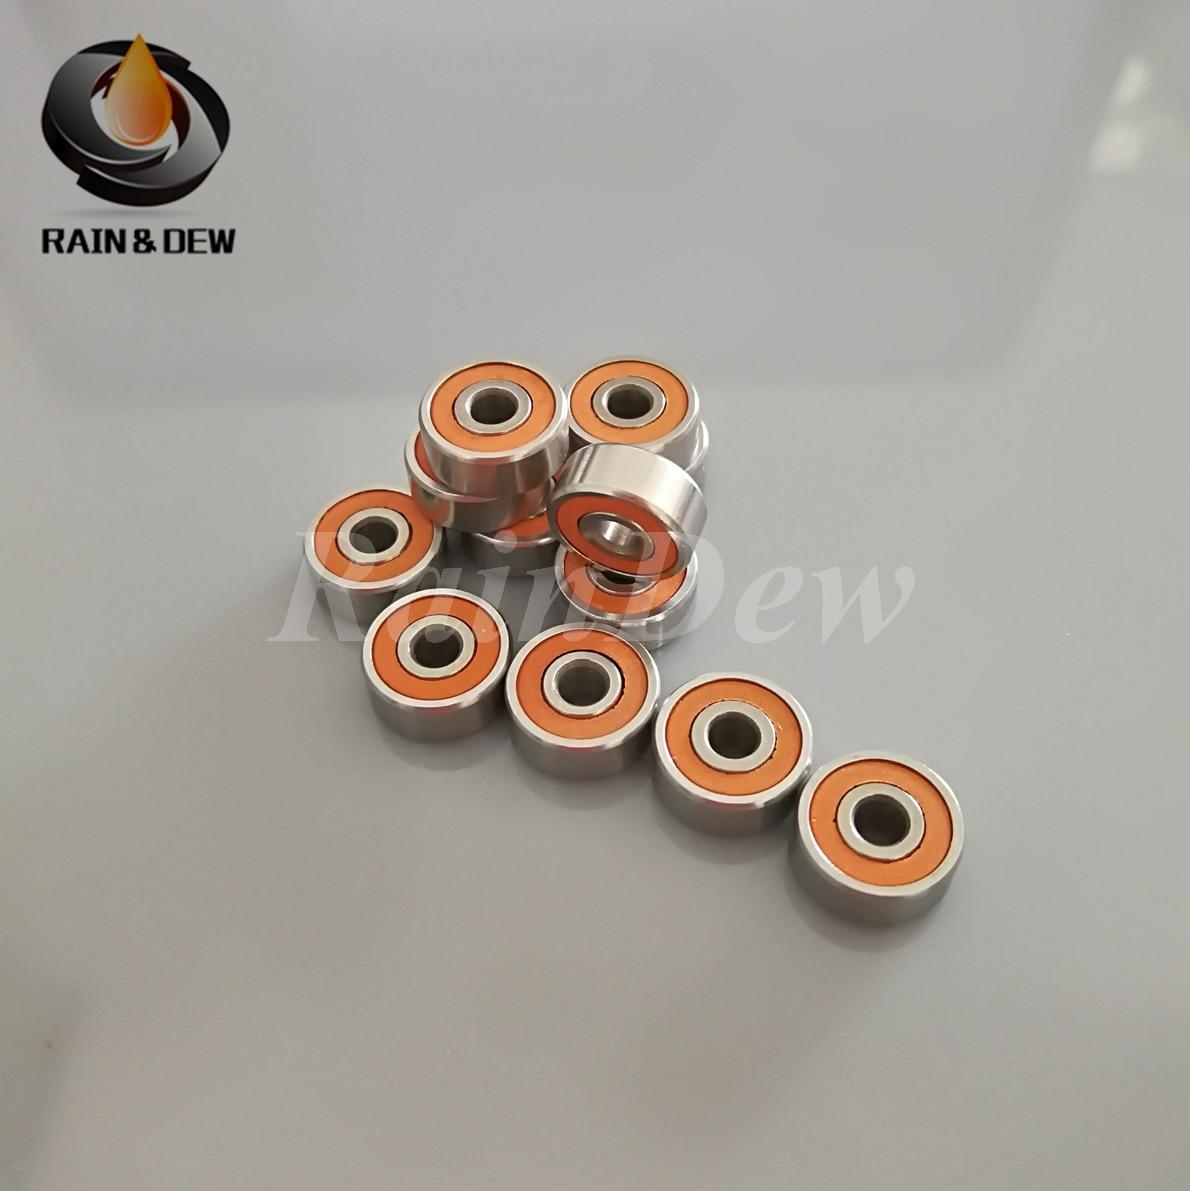 3X10X4 10Pcs 3x8x4 5Pcs 5x11x4 5Pcs Stainless Steel Hybrid Ceramic Shaft Bearings Fishing Reel Shaft Bearings